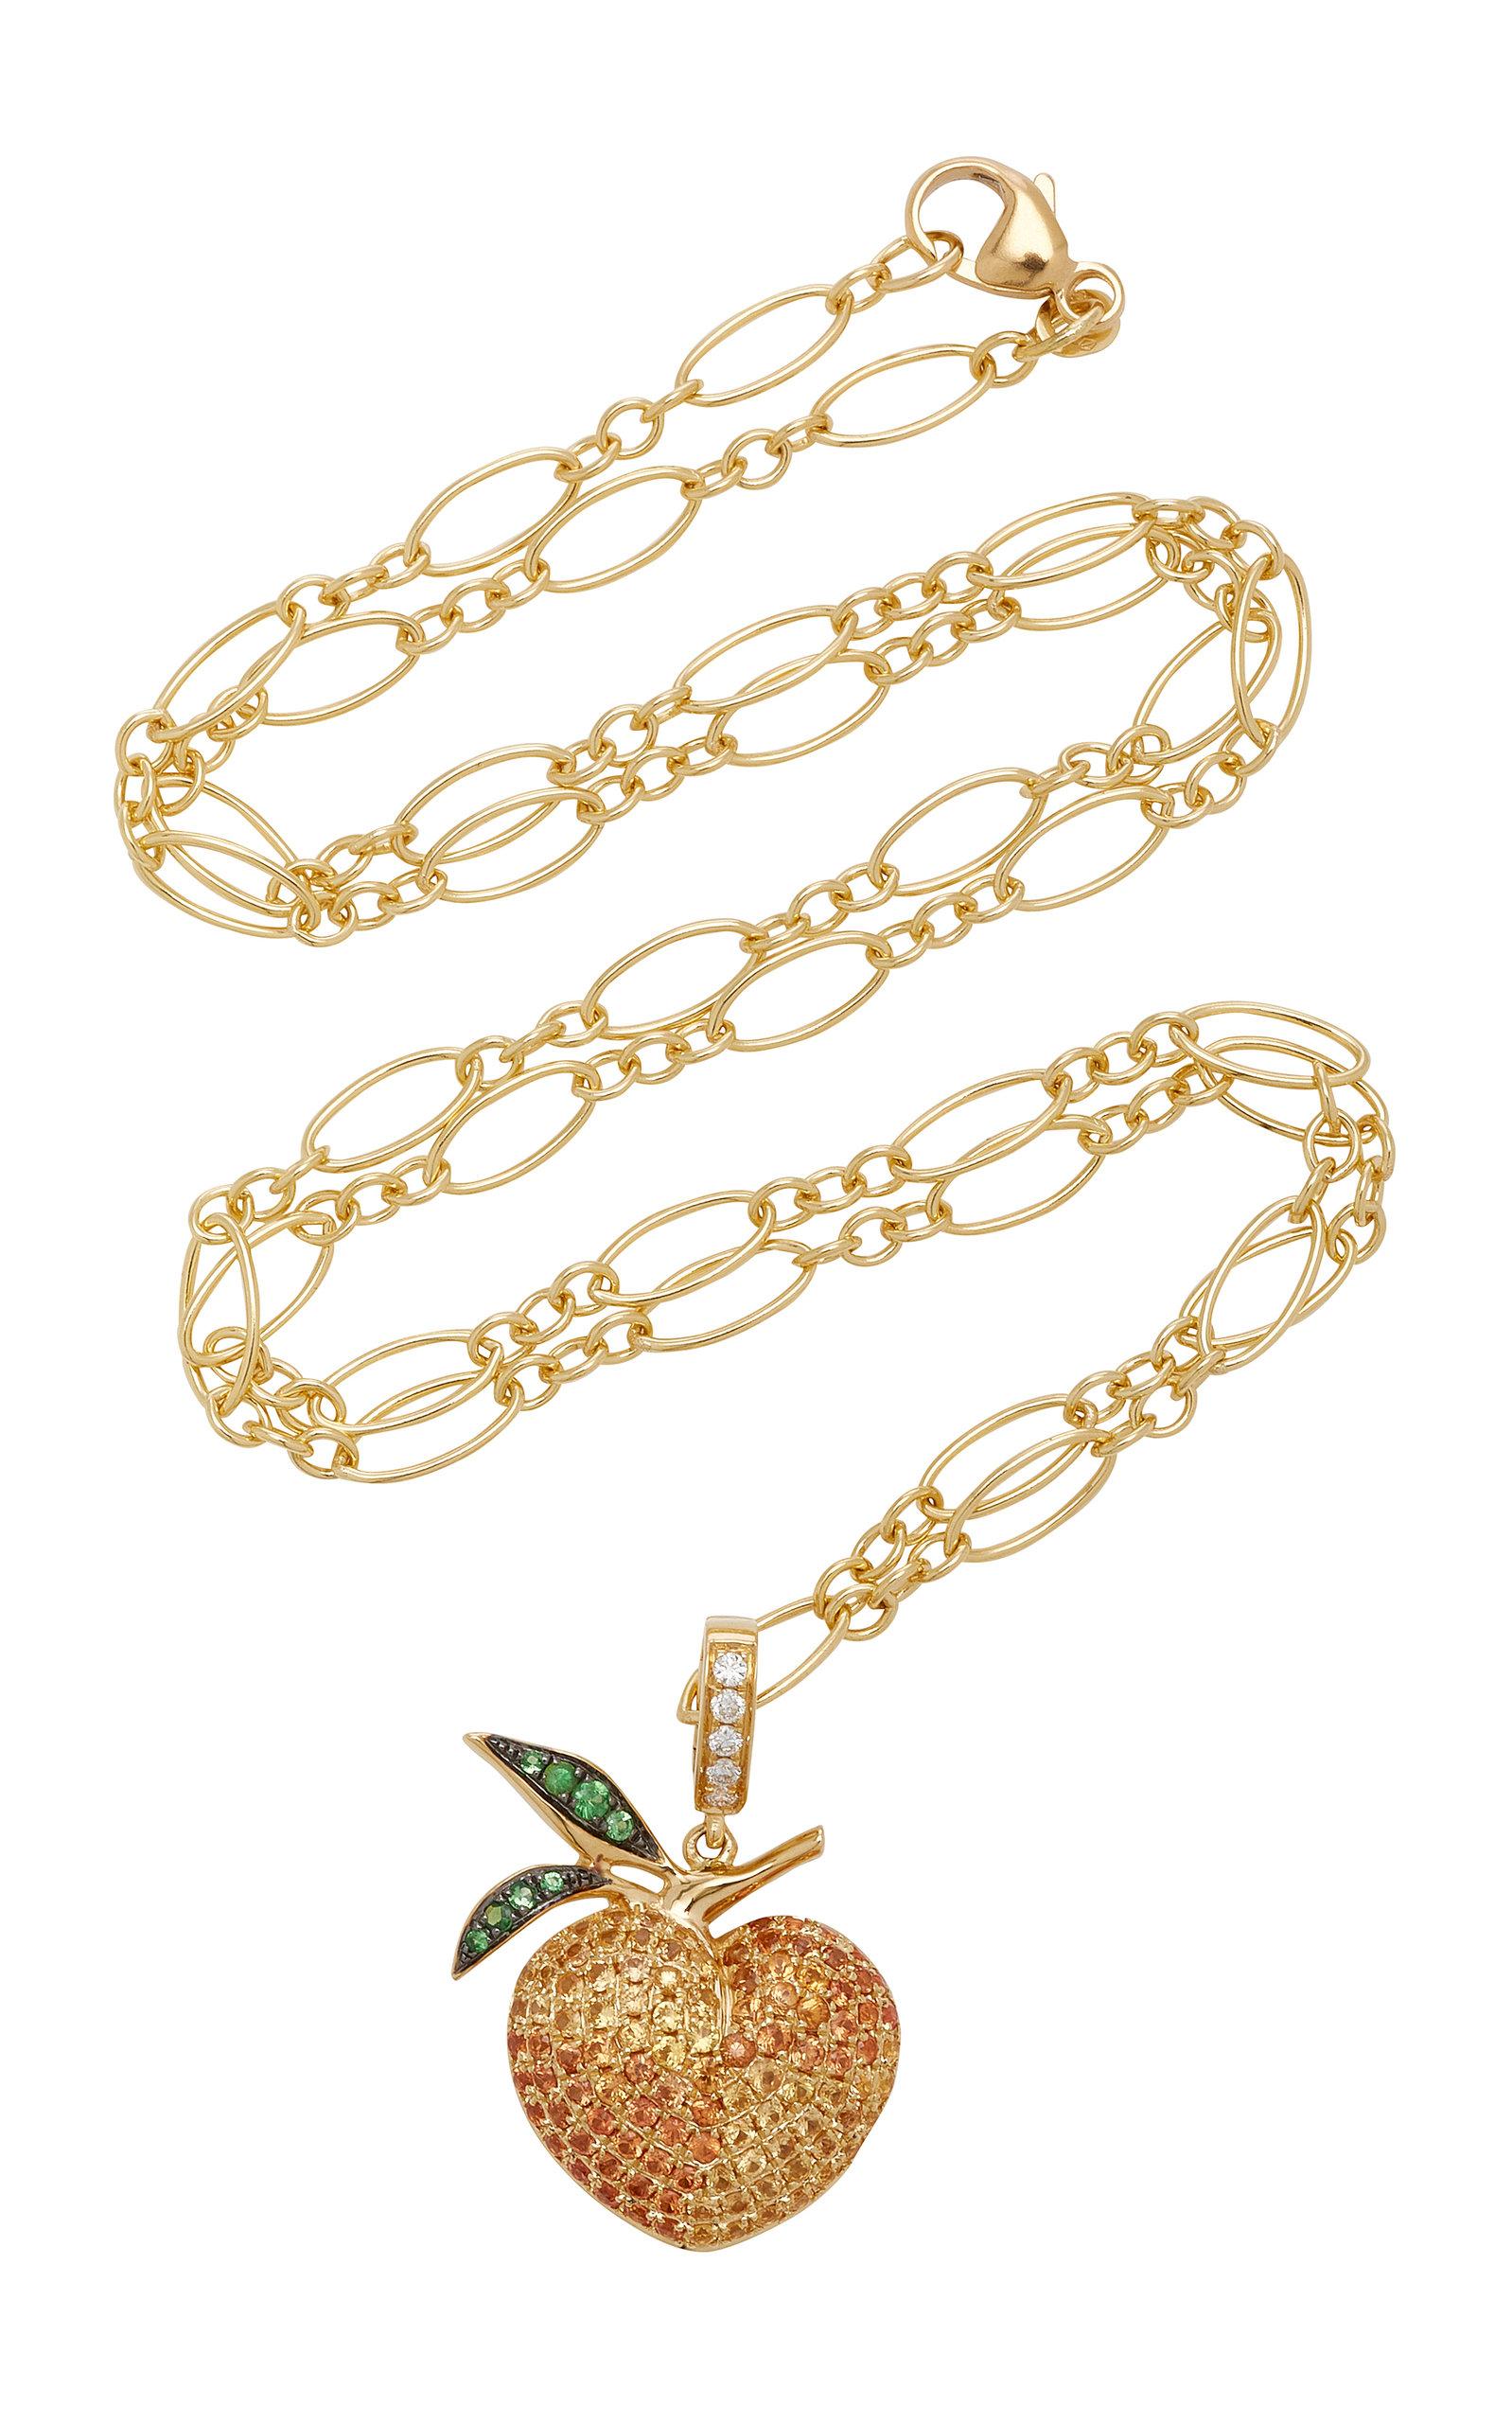 KHAI KHAI 18K Gold Sapphire Diamond And Tsavorite Charm in Multi